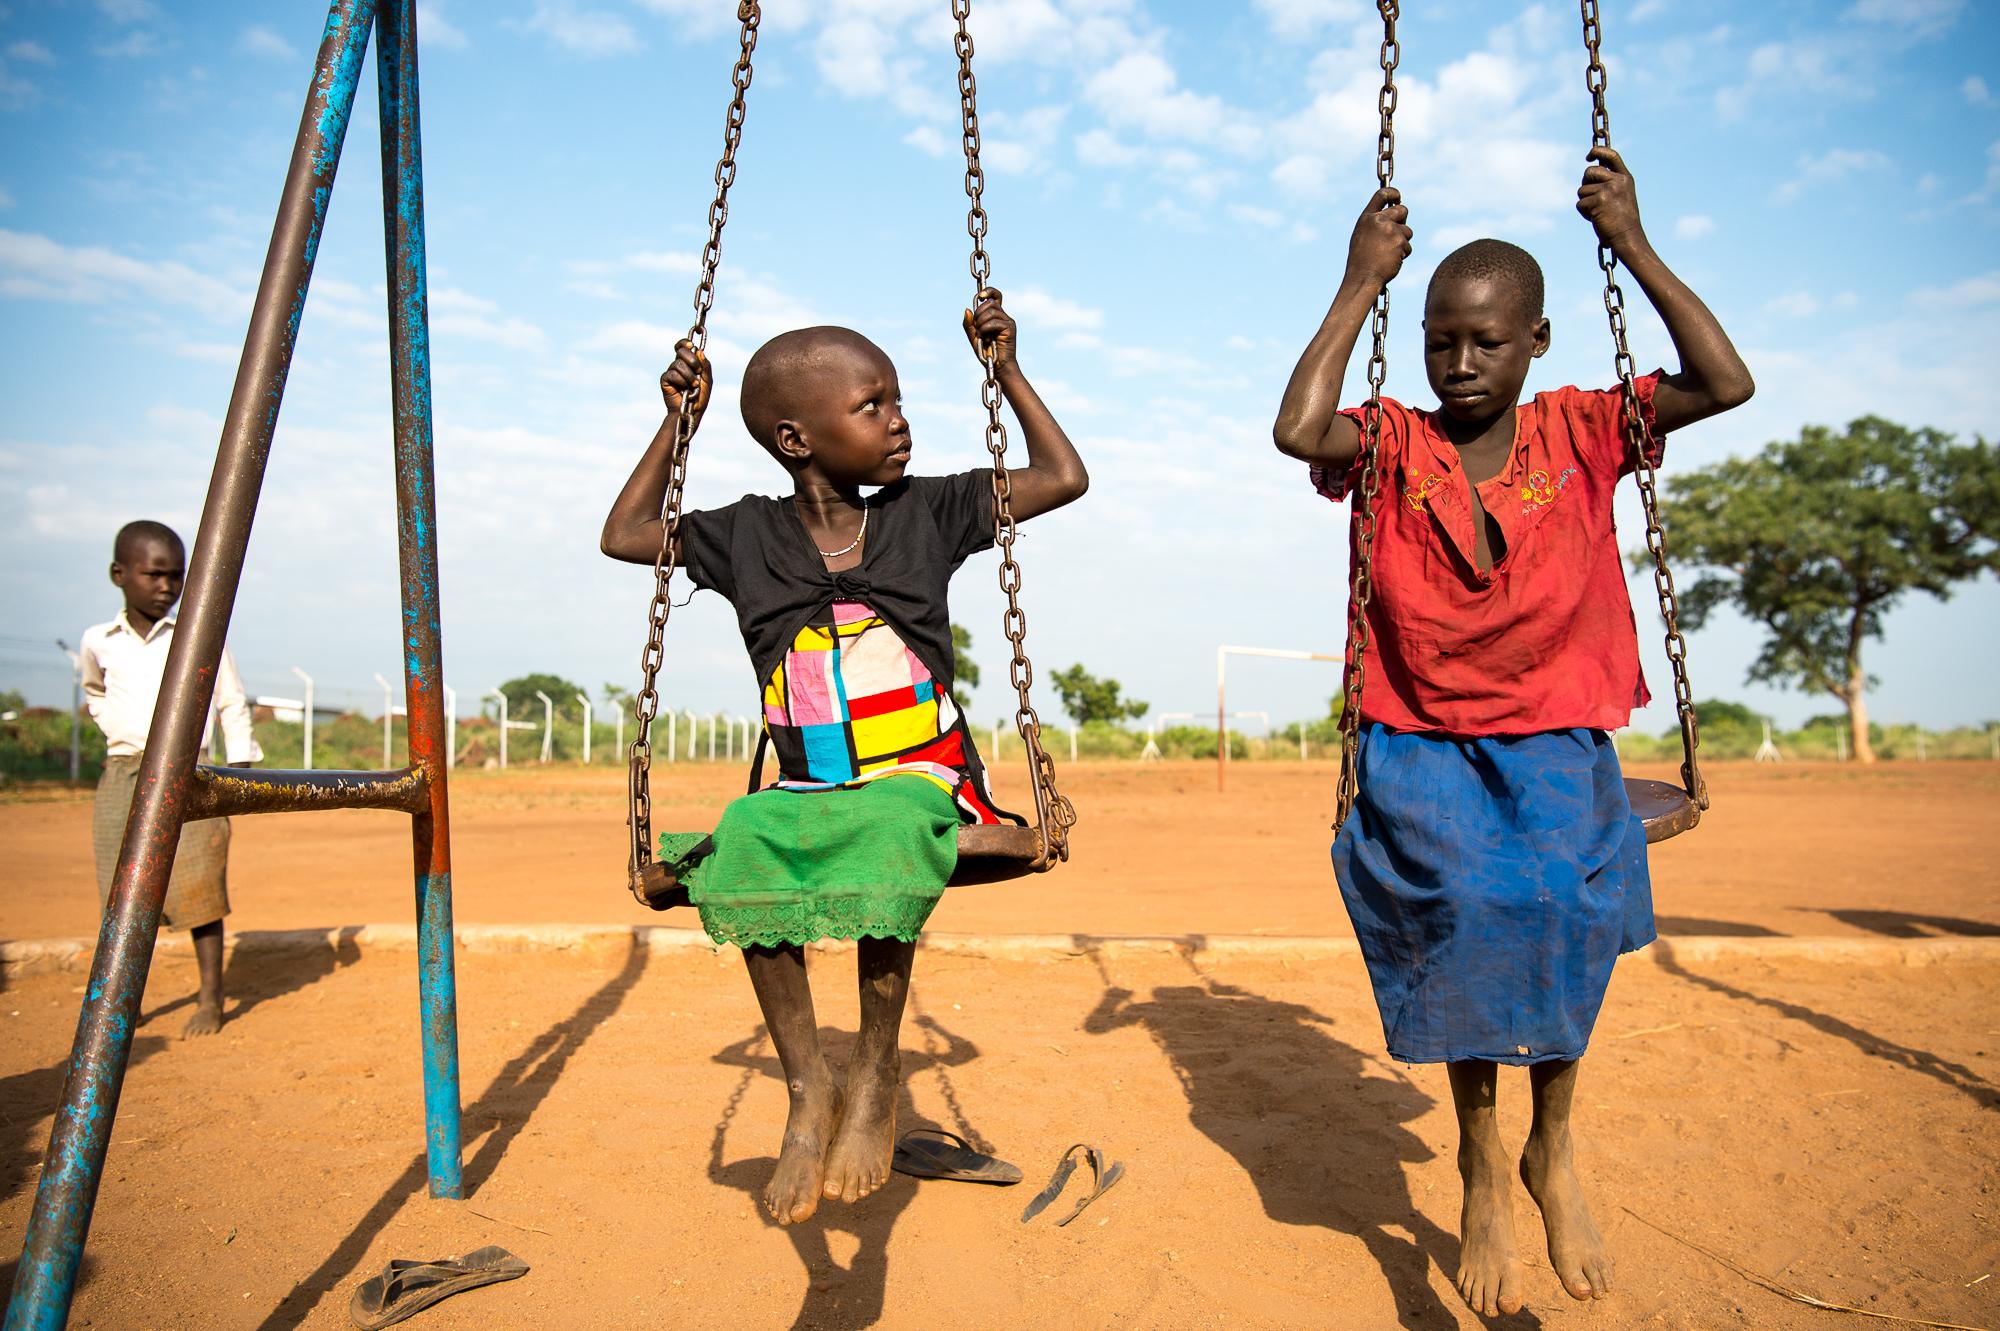 AE_SS16_UNICEF__12971.jpg